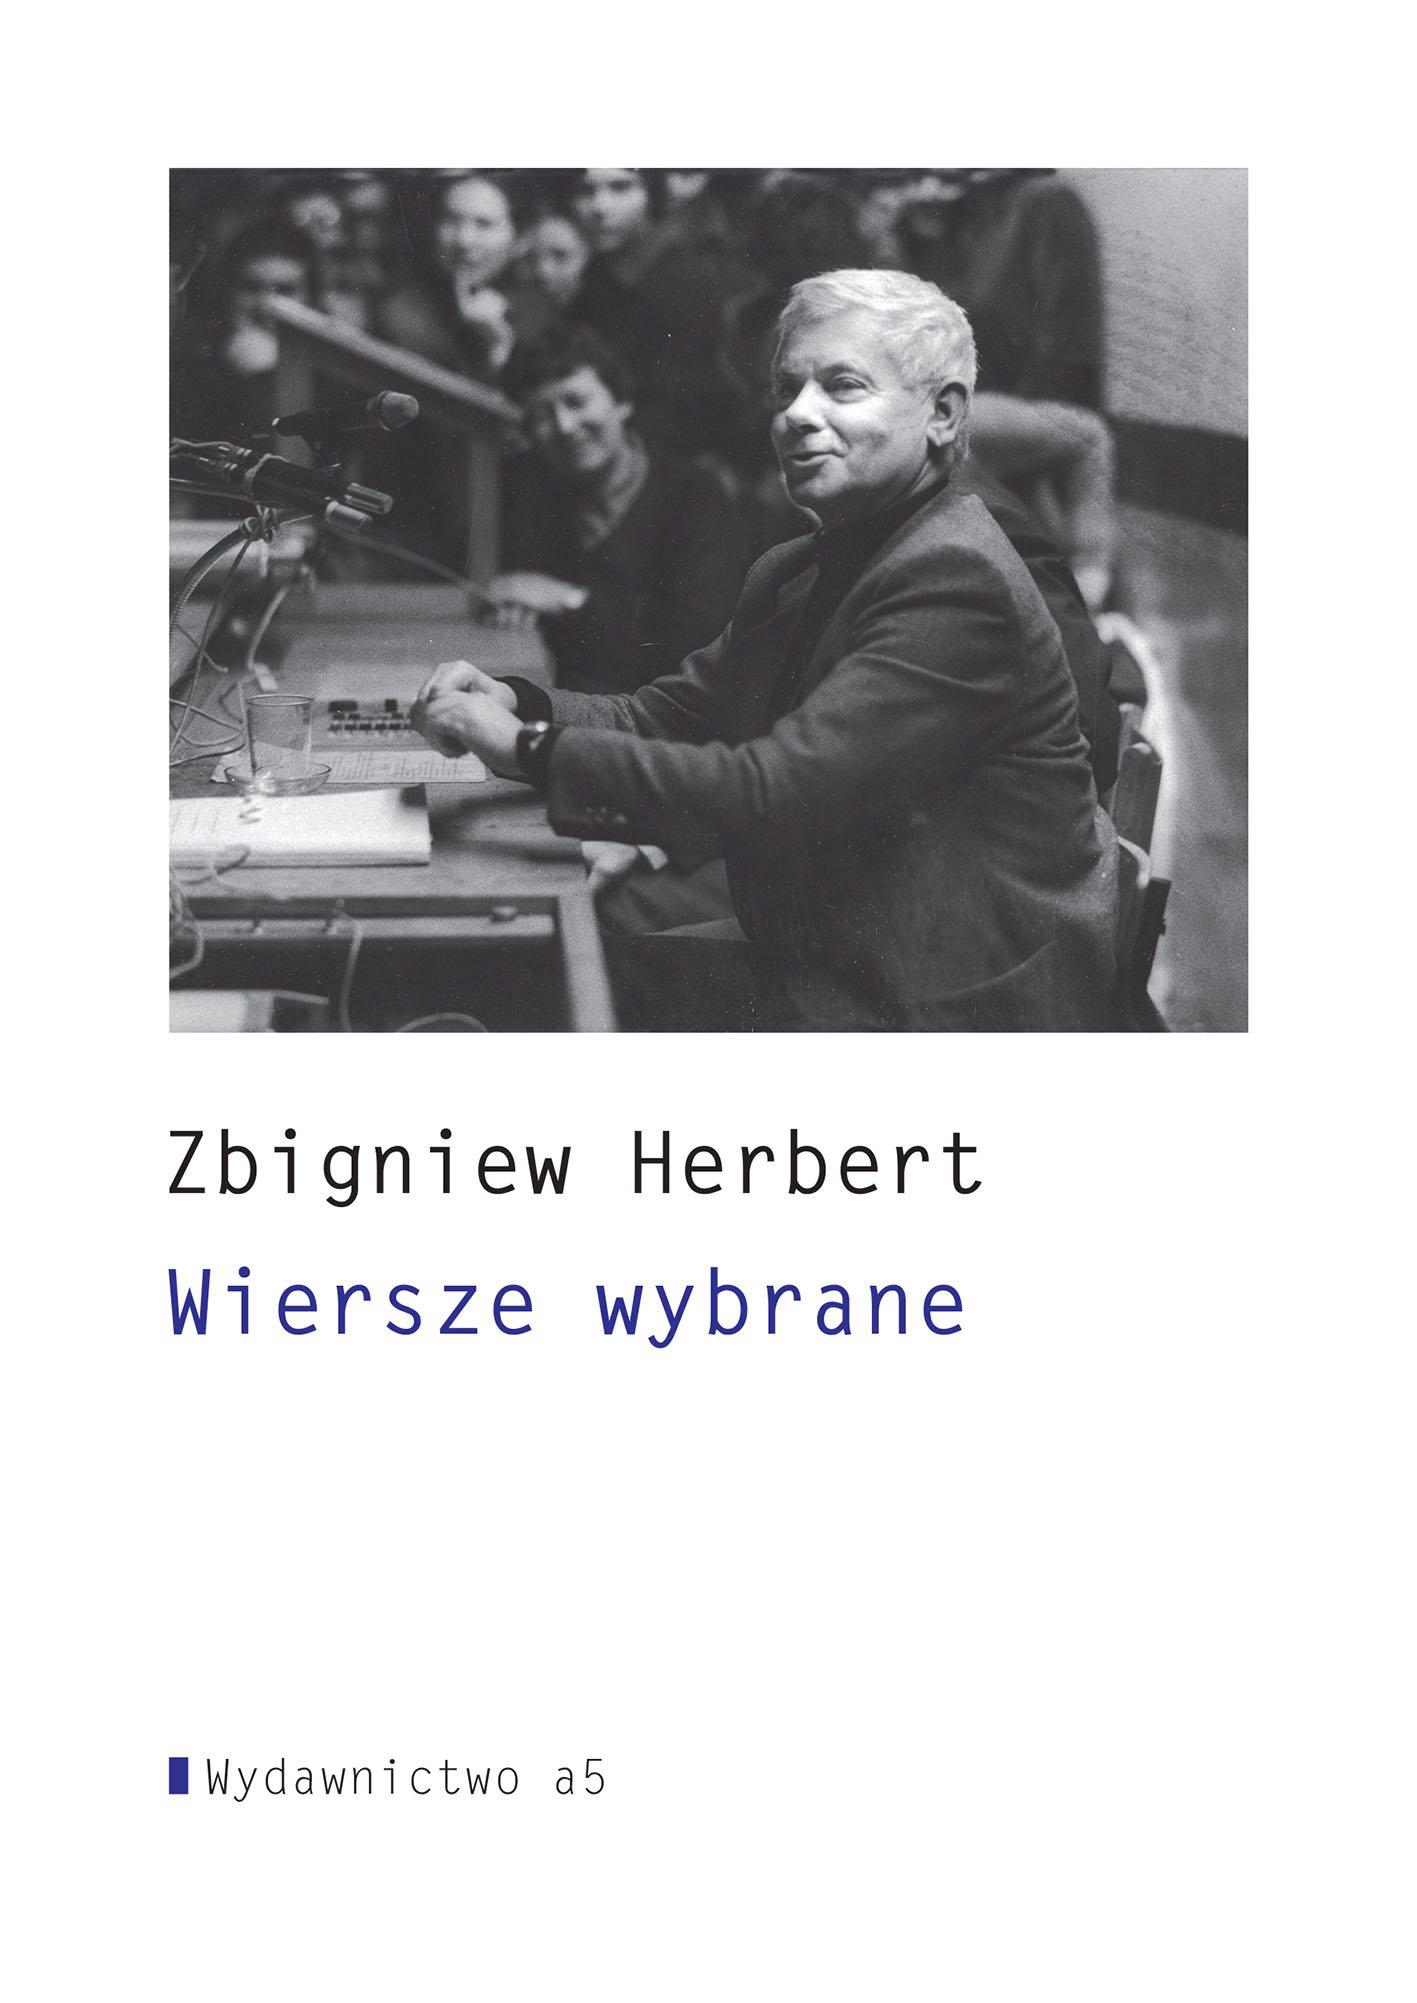 Wiersze Wybrane Cd 1 Amazones Zbigniew Herbert Libros